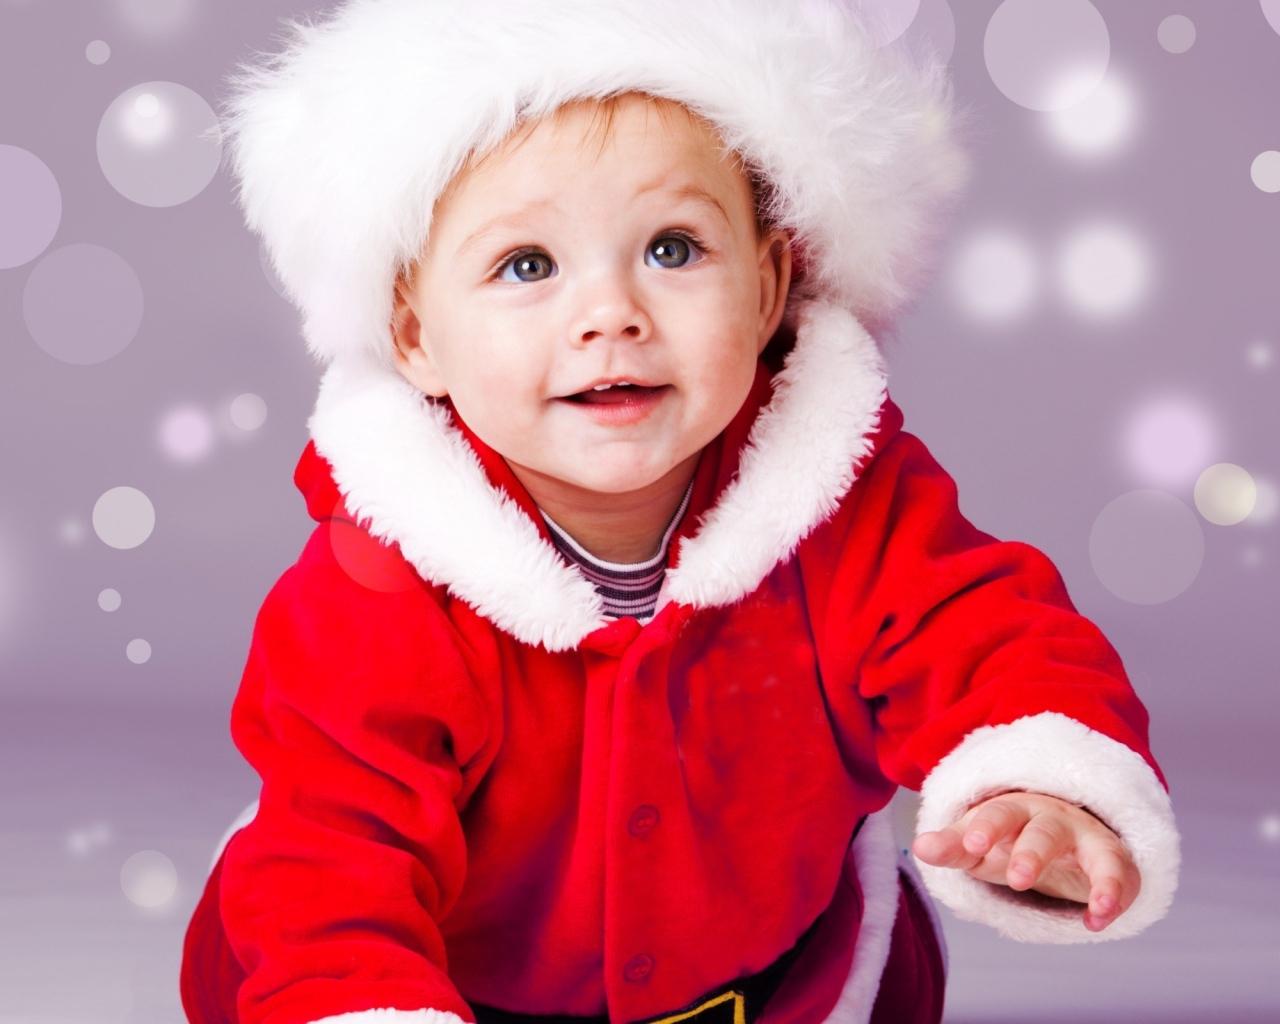 child_face_hat_smile_snow_93213_1280x1024